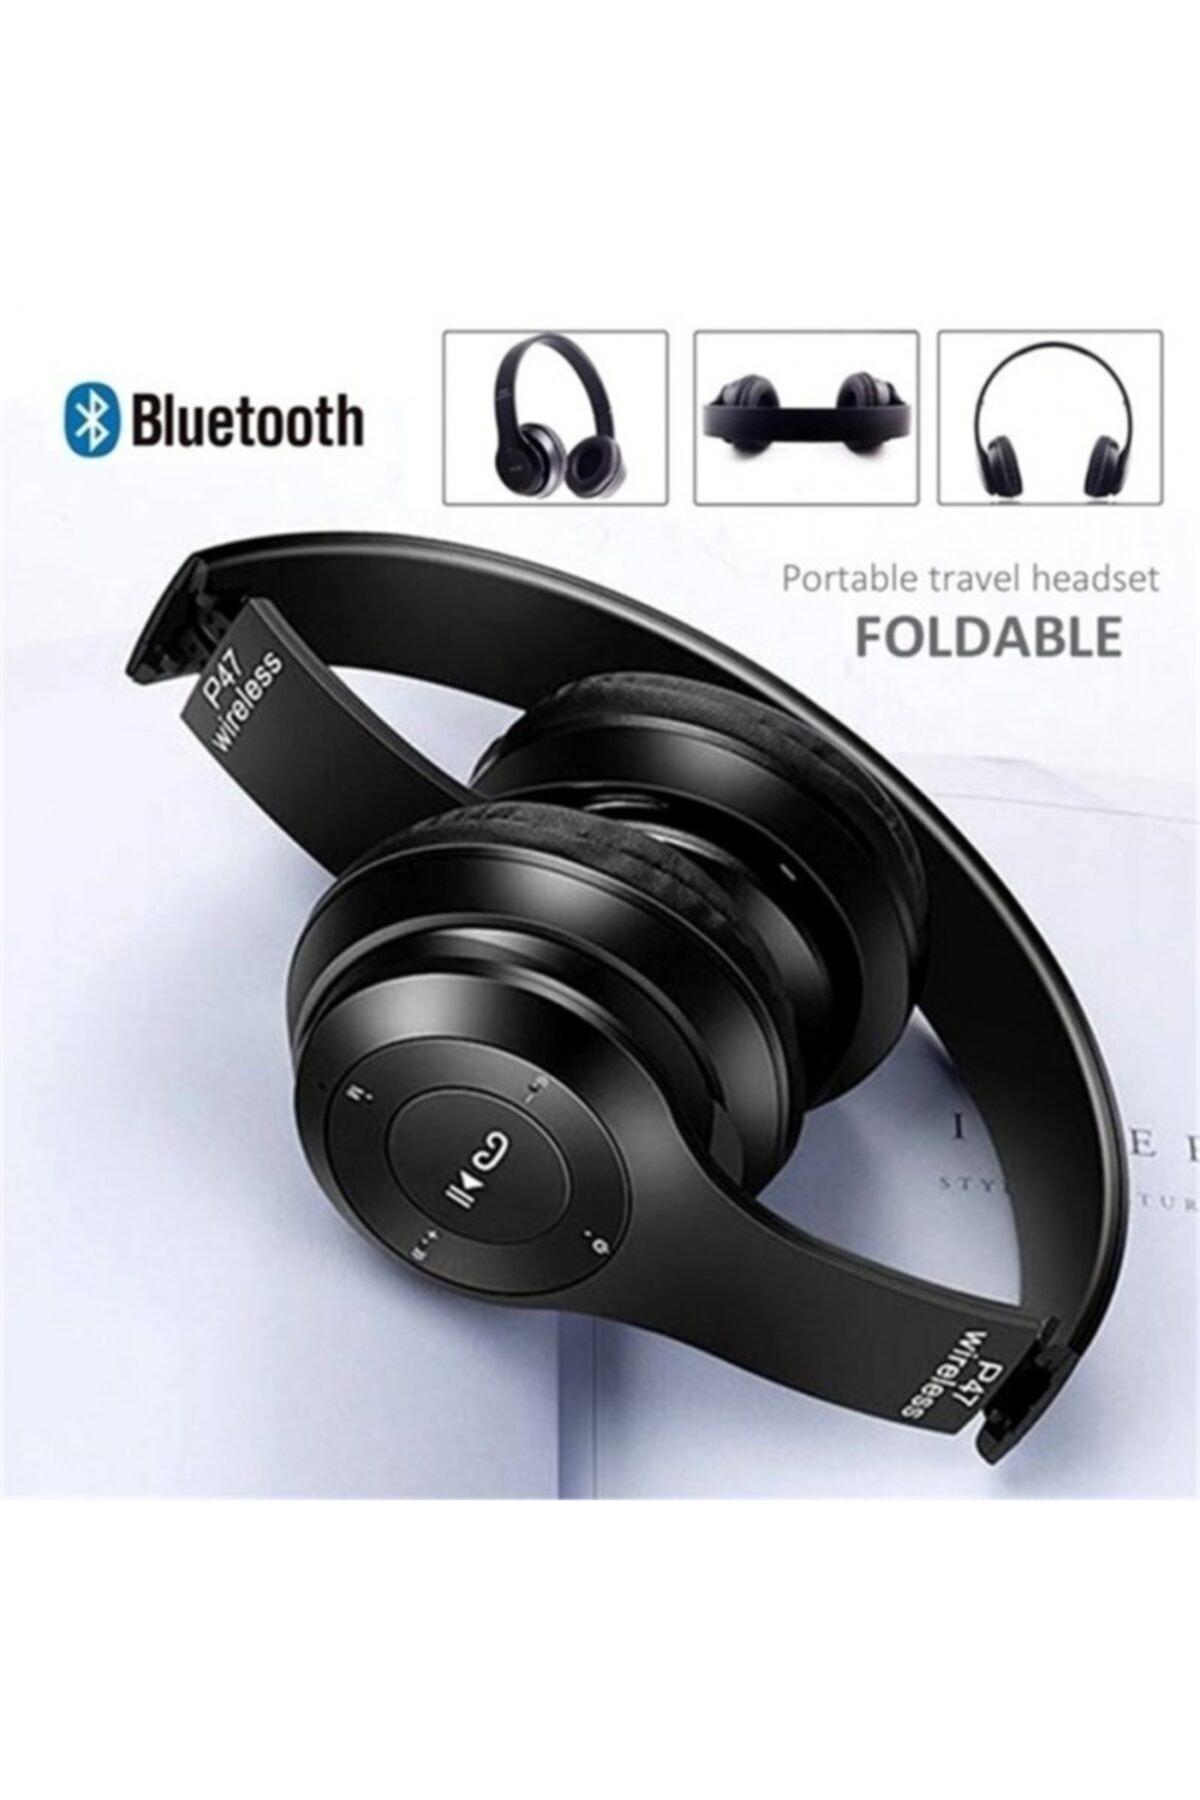 P47 5.0+edr Wireless Aux Kablolu Bluetooth Kulaklık 5.0+edr-p47